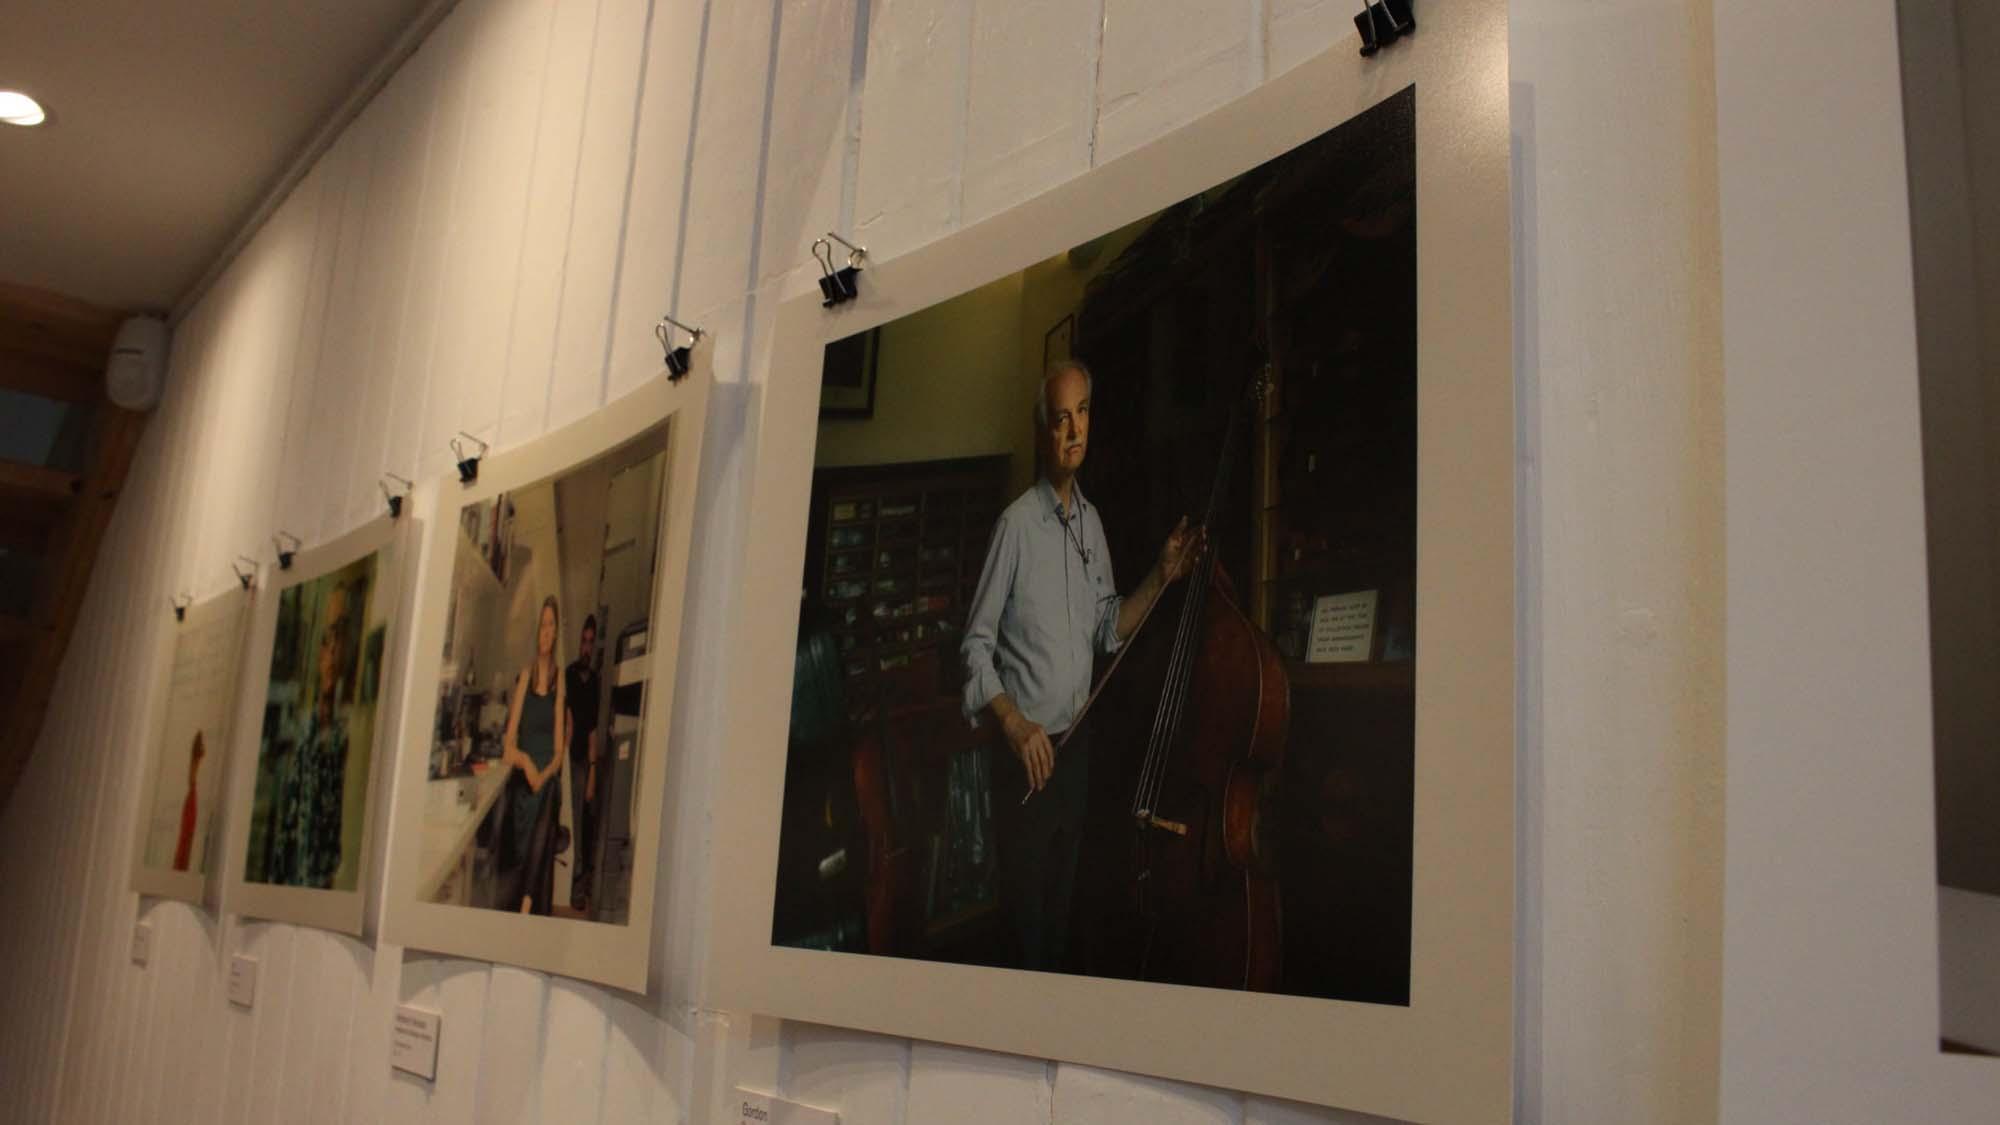 Upright Gallery: Between Bruntsfield and Tollcross by Inzajeano Latif